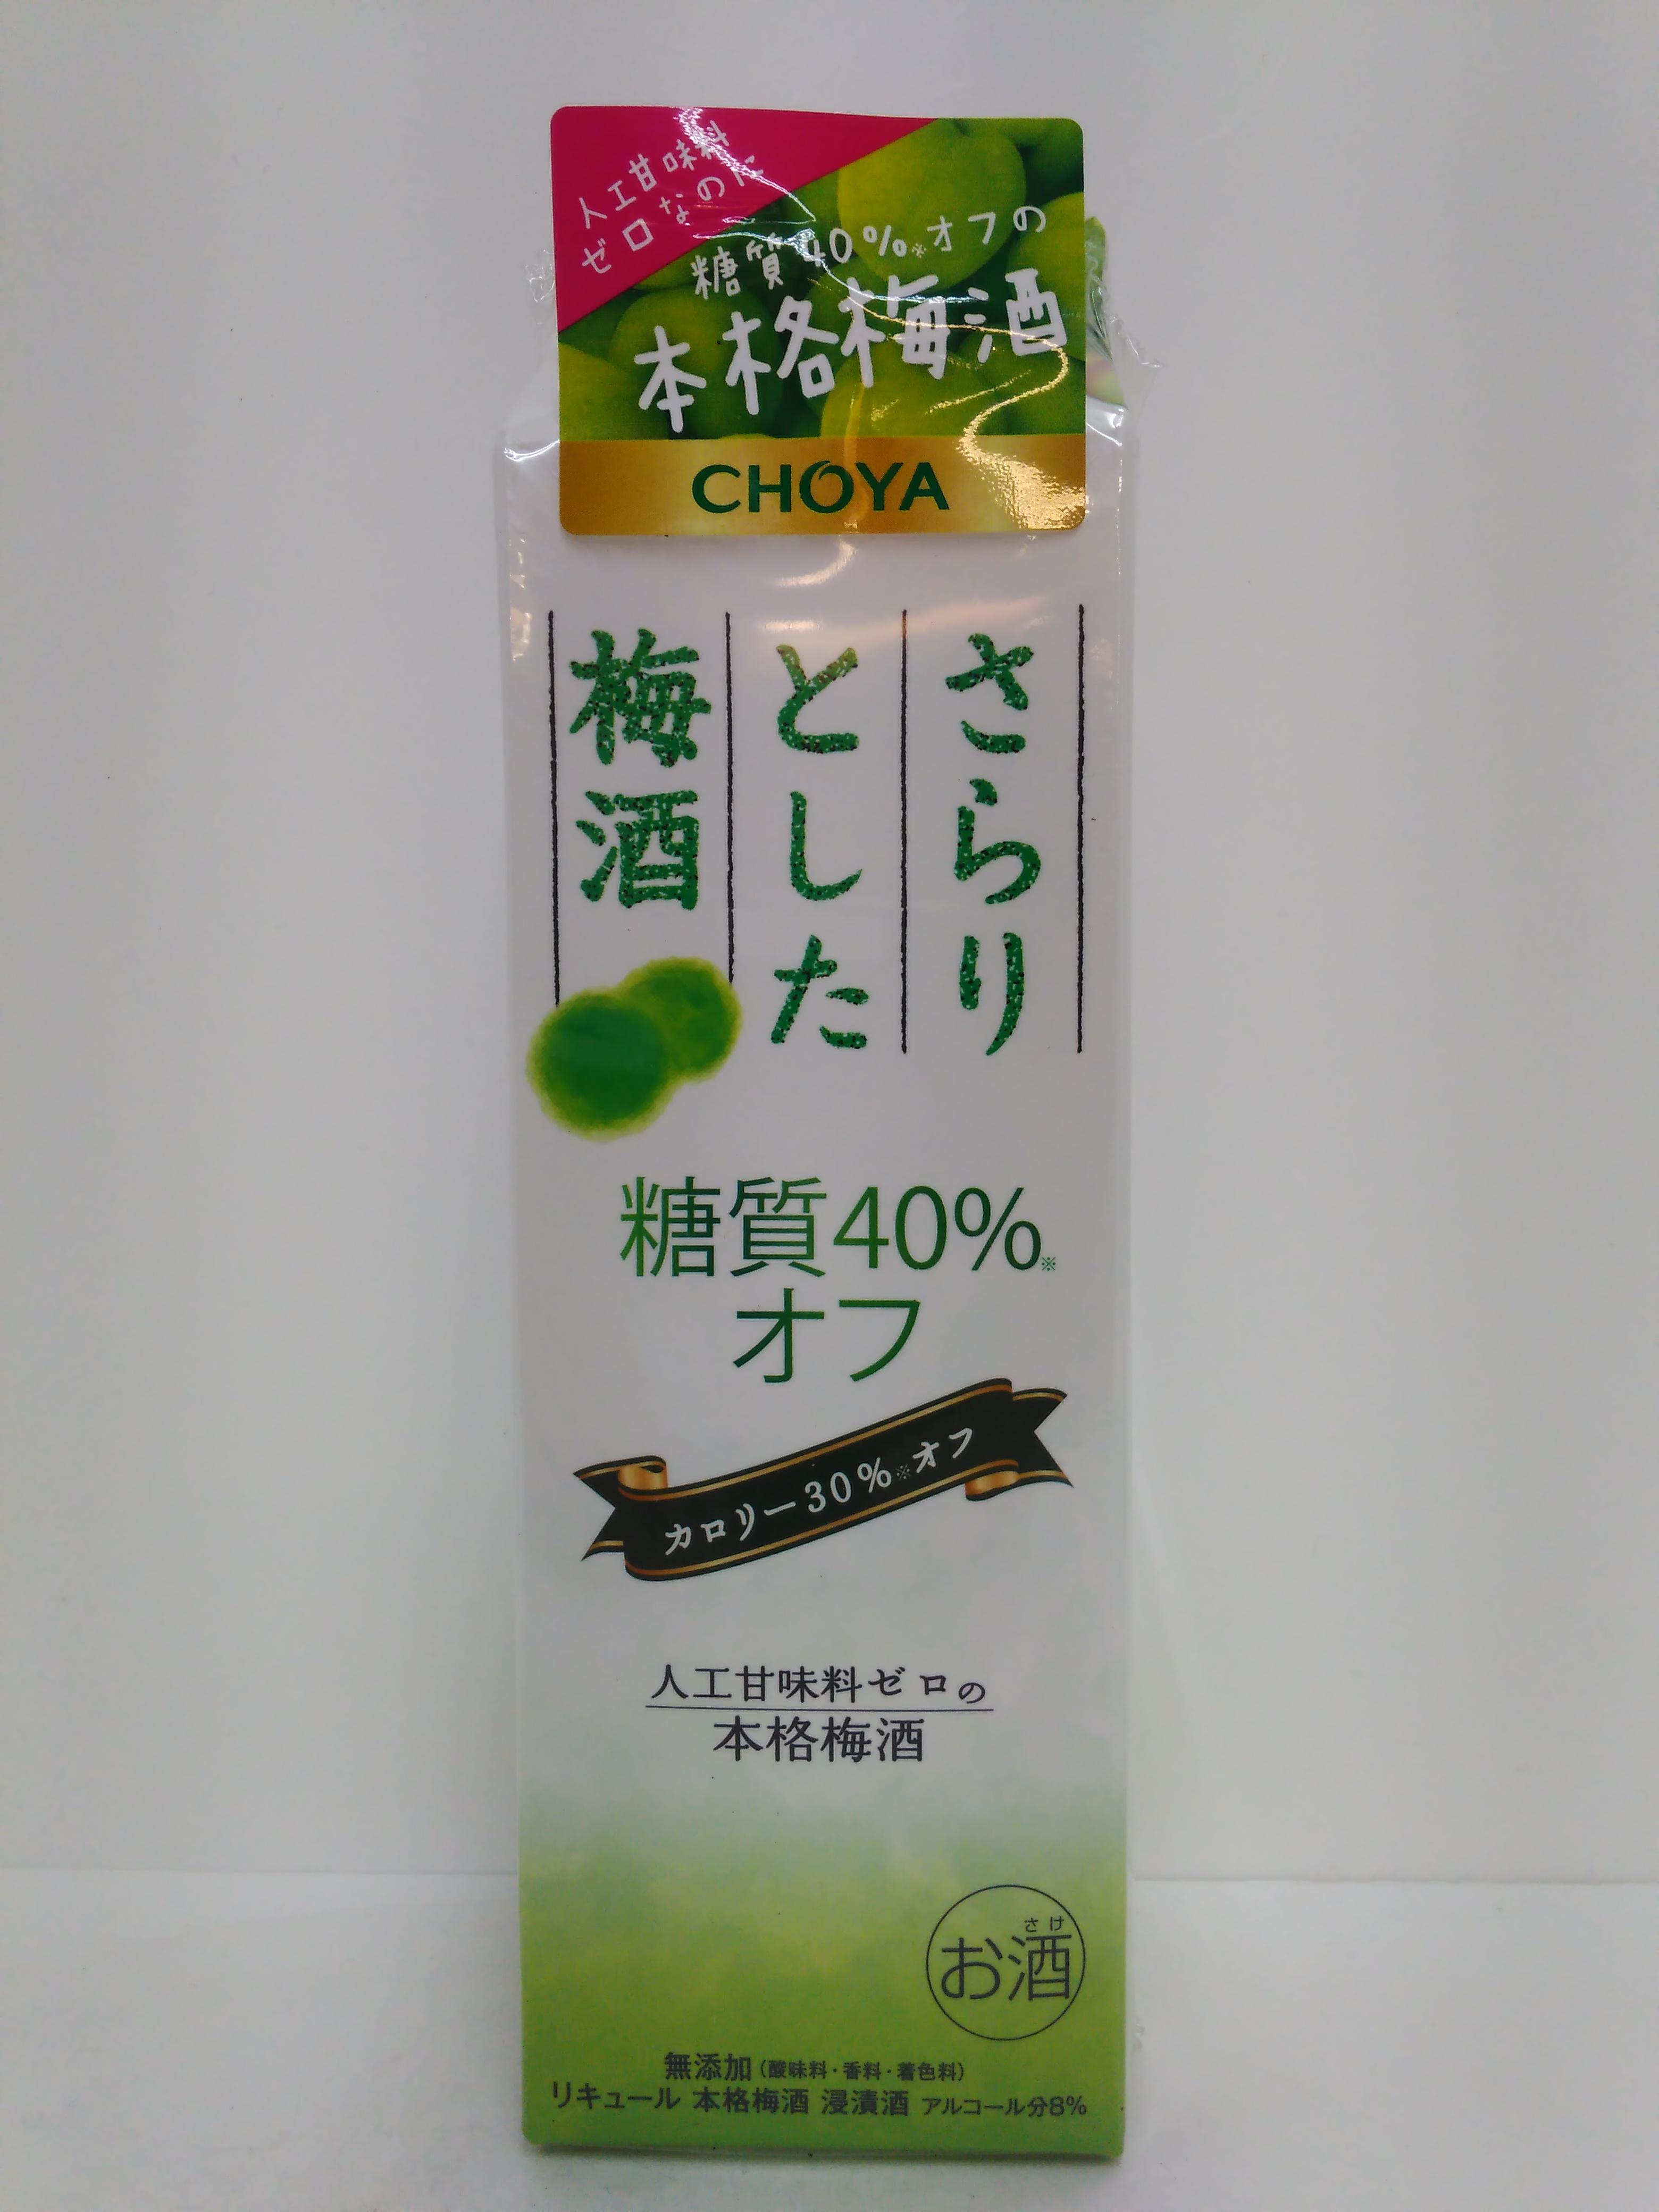 【TAKEYAスマイル便 対象品】チョーヤ さらりとした梅酒 糖質40%オフ 1000ml